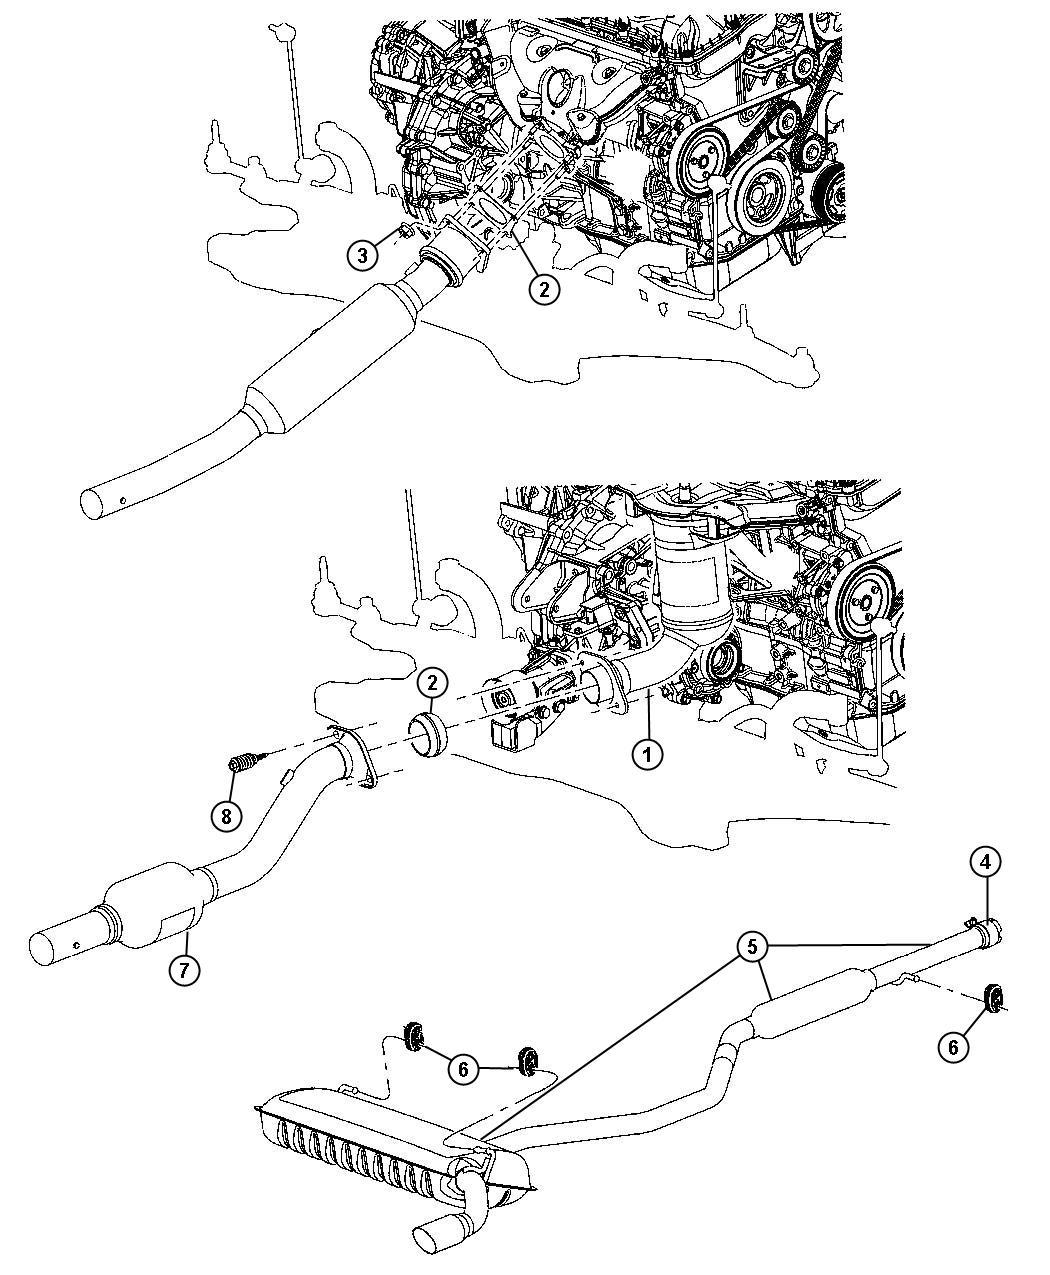 Jeep Patriot Exhaust System 2 4l 2 4l 4 Cyl Dohc 16v